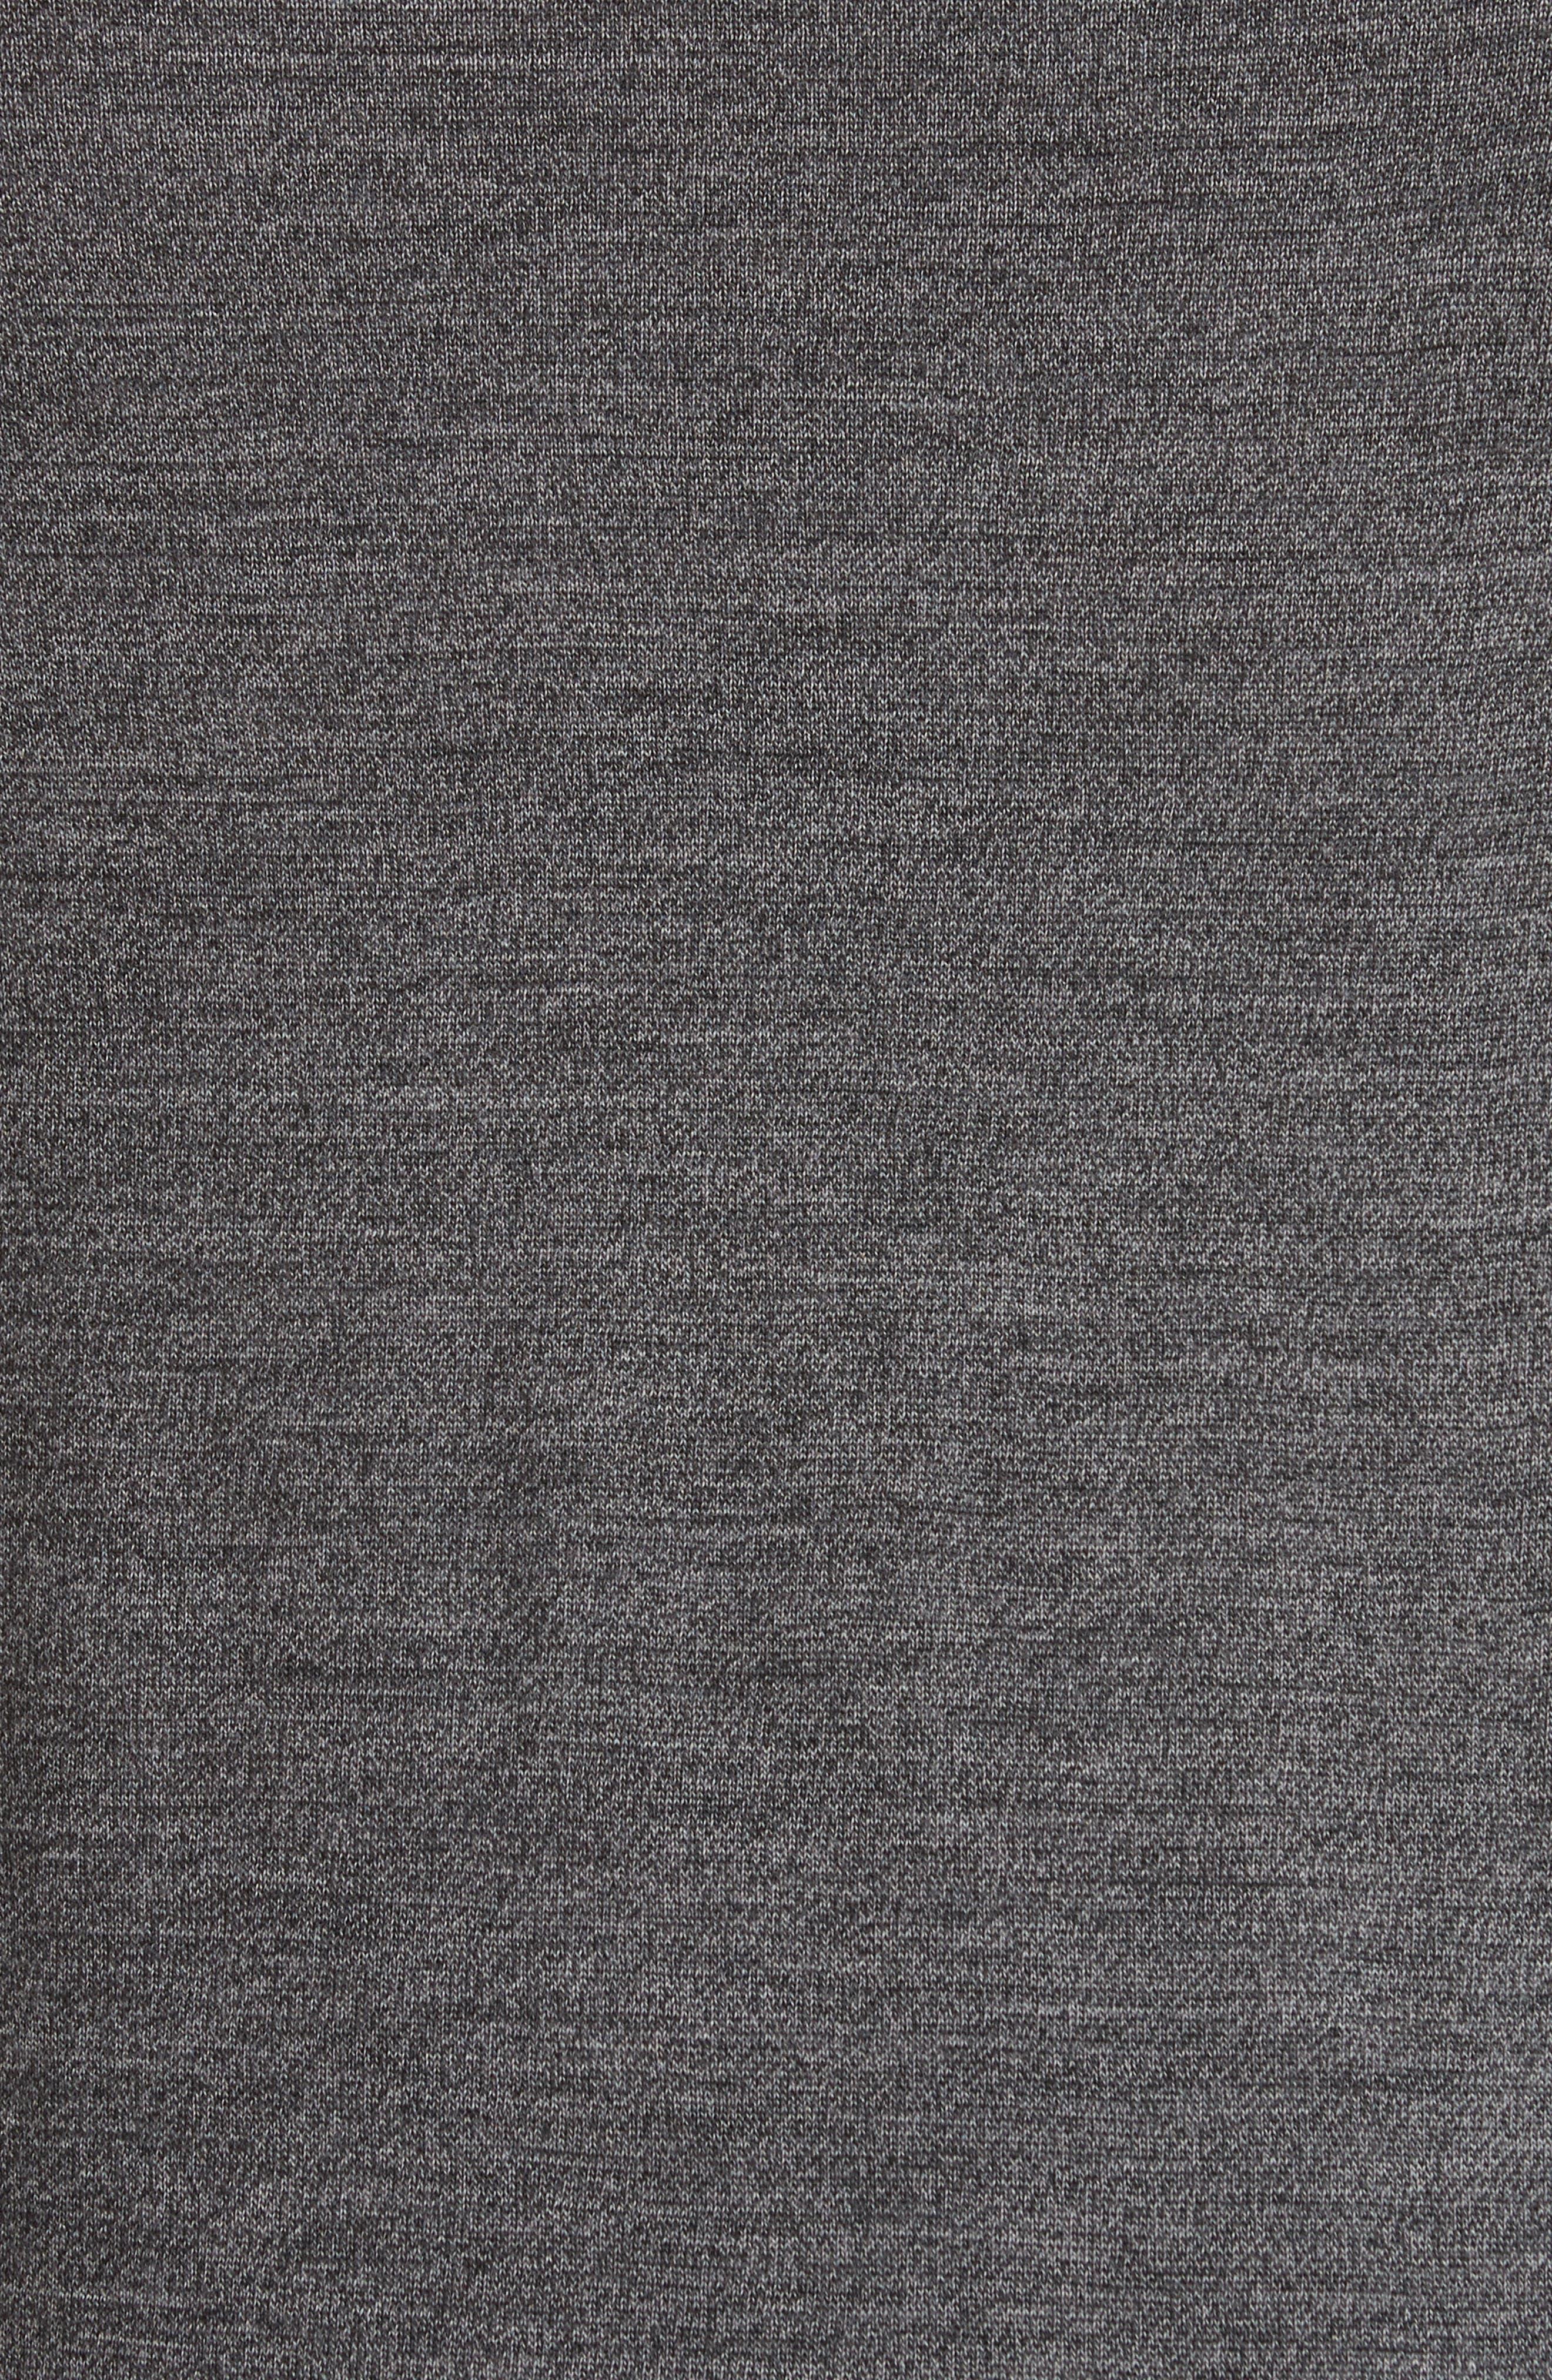 Crewneck Merino Wool Blend Sweater,                             Alternate thumbnail 5, color,                             Grey